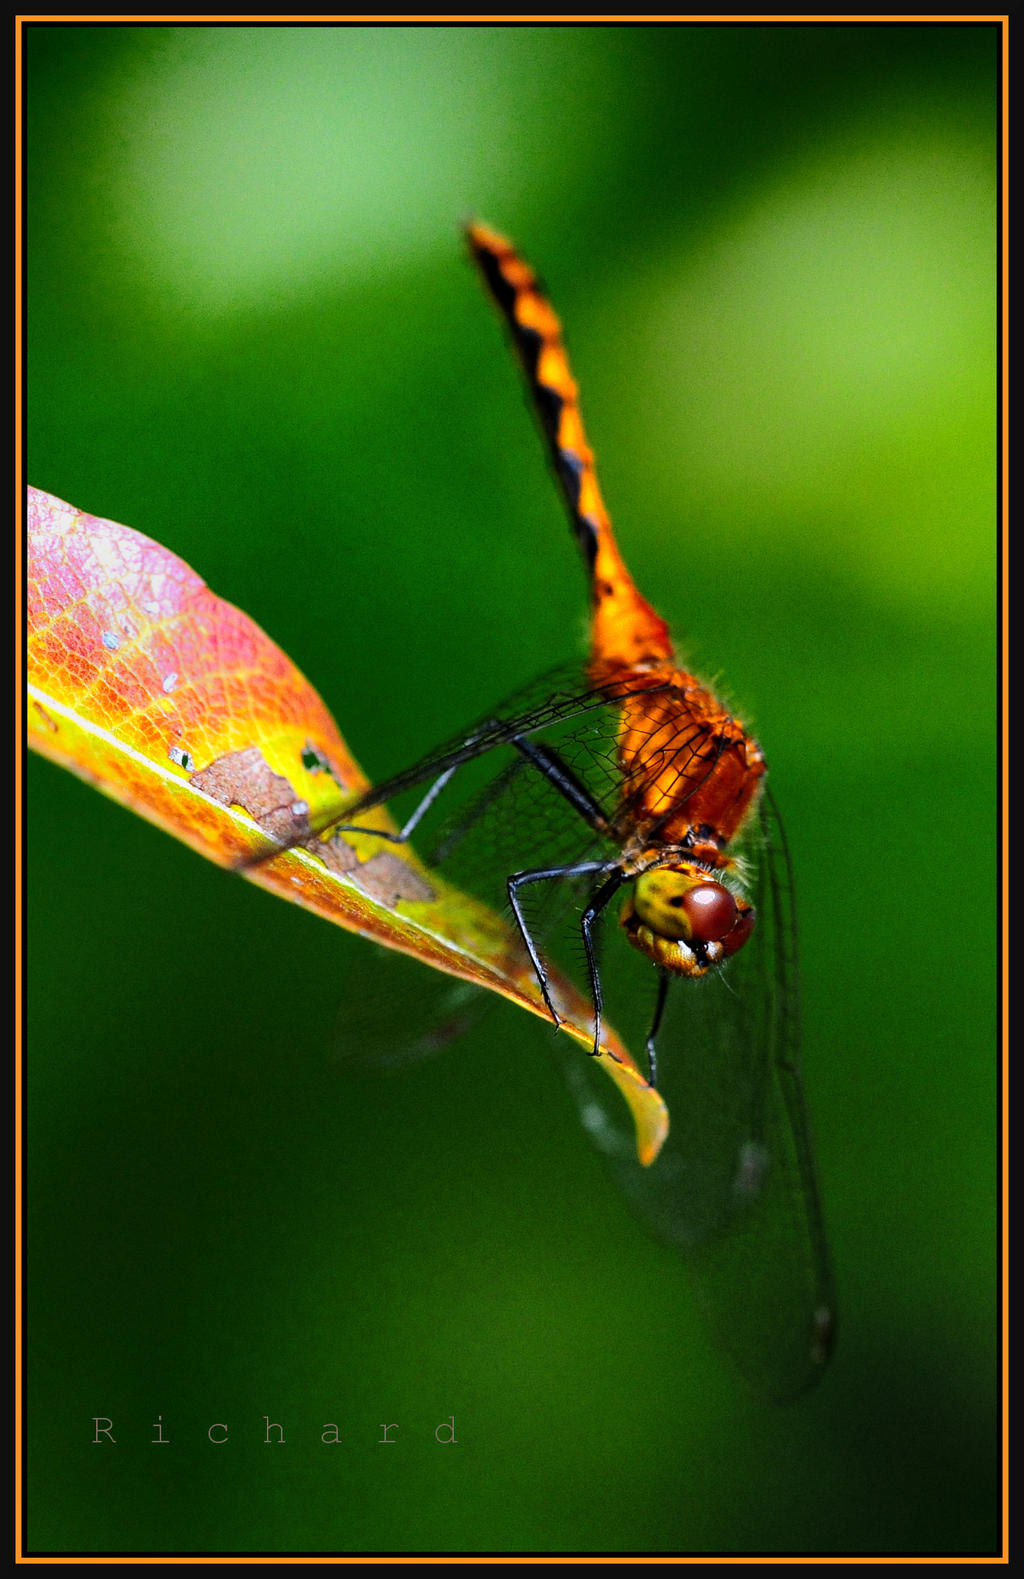 dragonfly 1 by RichardRobert